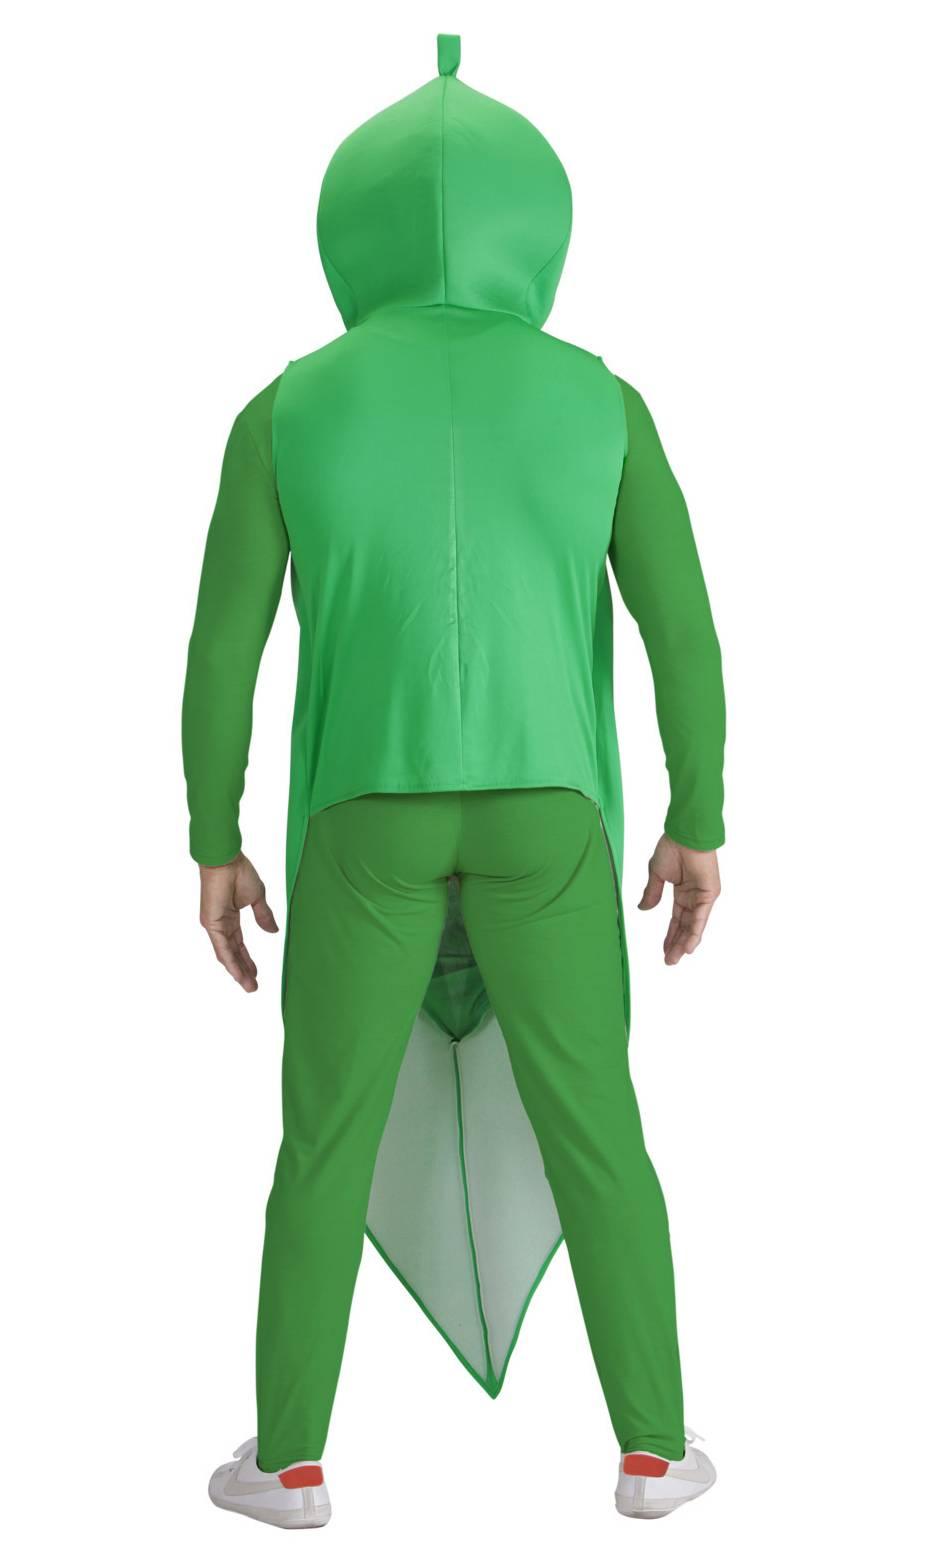 Costume-de-petit-pois-2